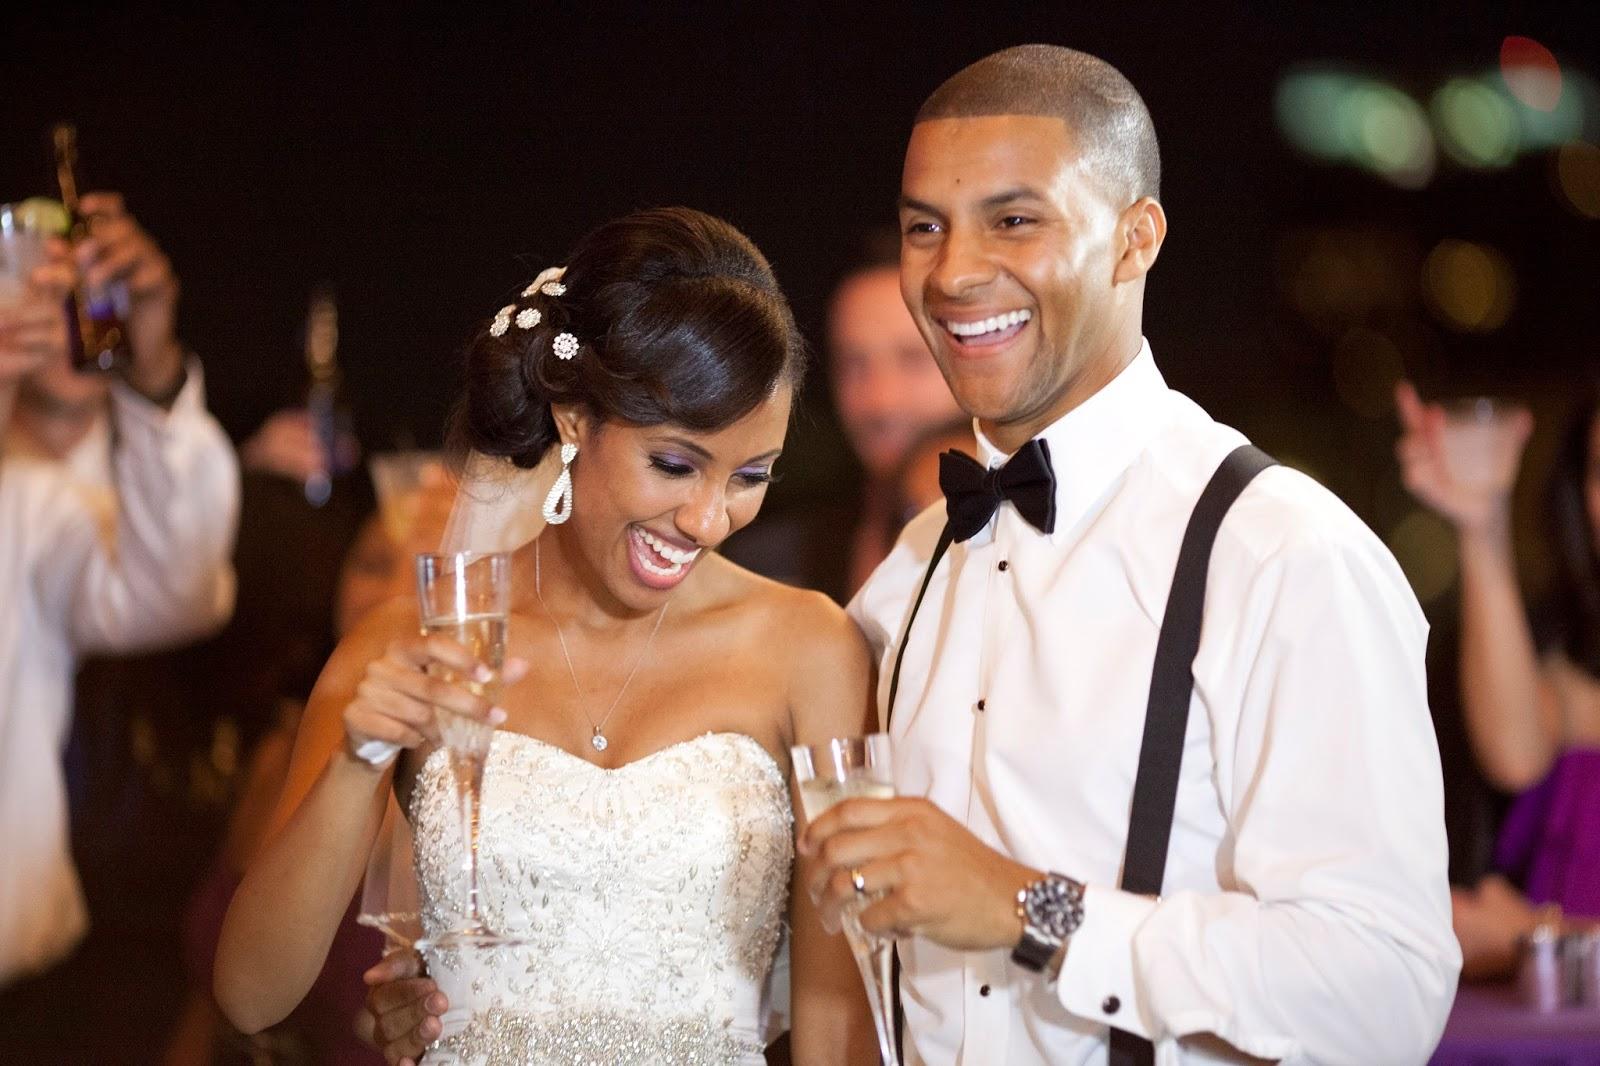 seti harrys uptown wedding rich in ethiopian wedding dress Head Over Heels Charlotte NC Wedding Event Planners Seti Harry s Uptown Wedding Rich in Tradition